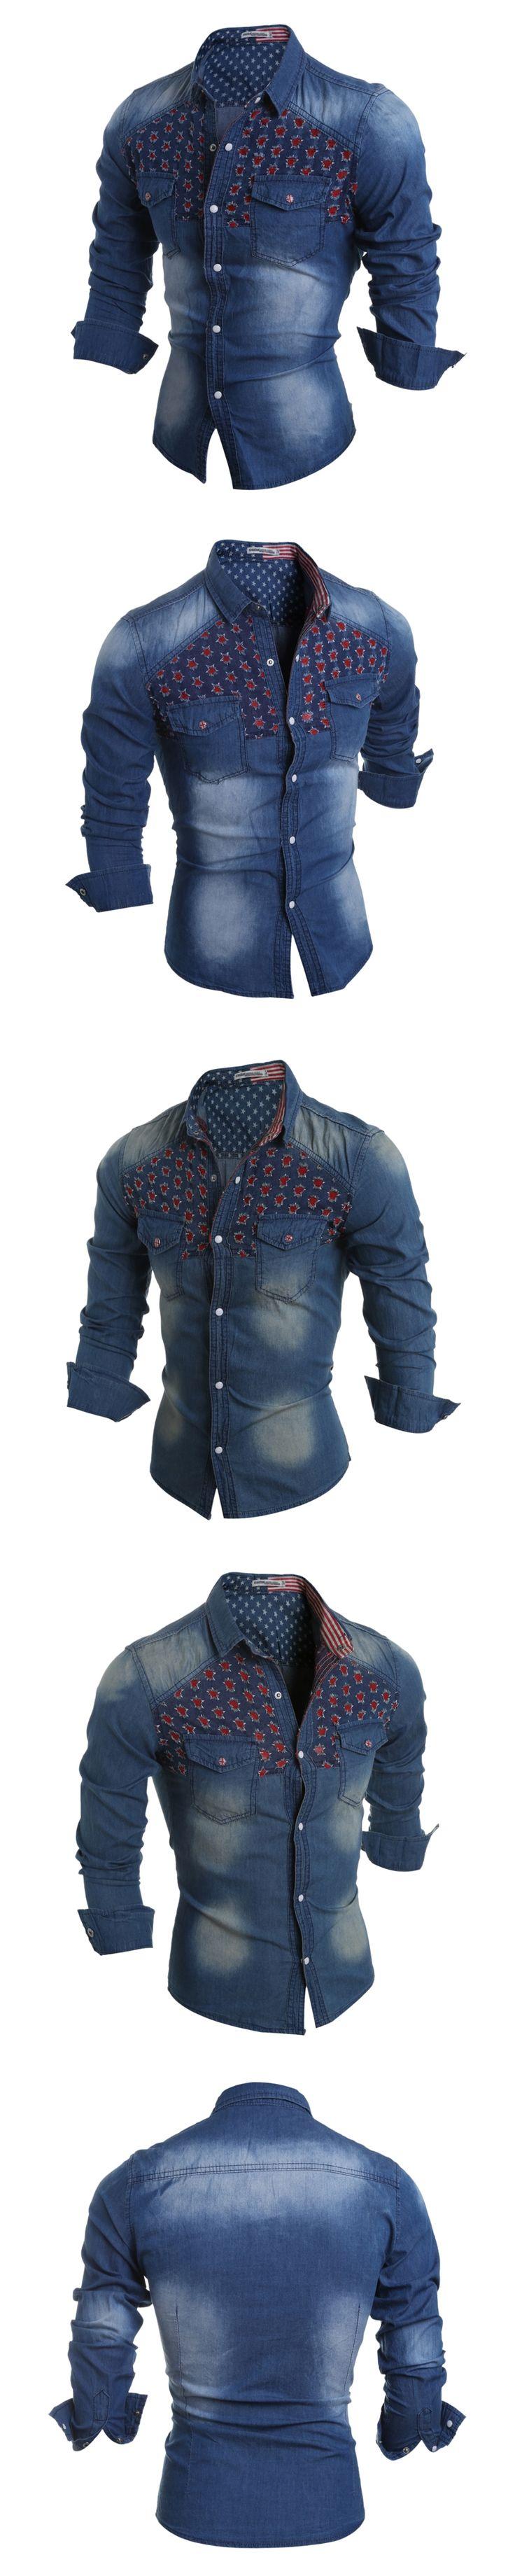 Men Shirt Size:M-2XL Hot Sale Fashion Casual Autumn Winter Men's Washed Stitching Denim Shirts